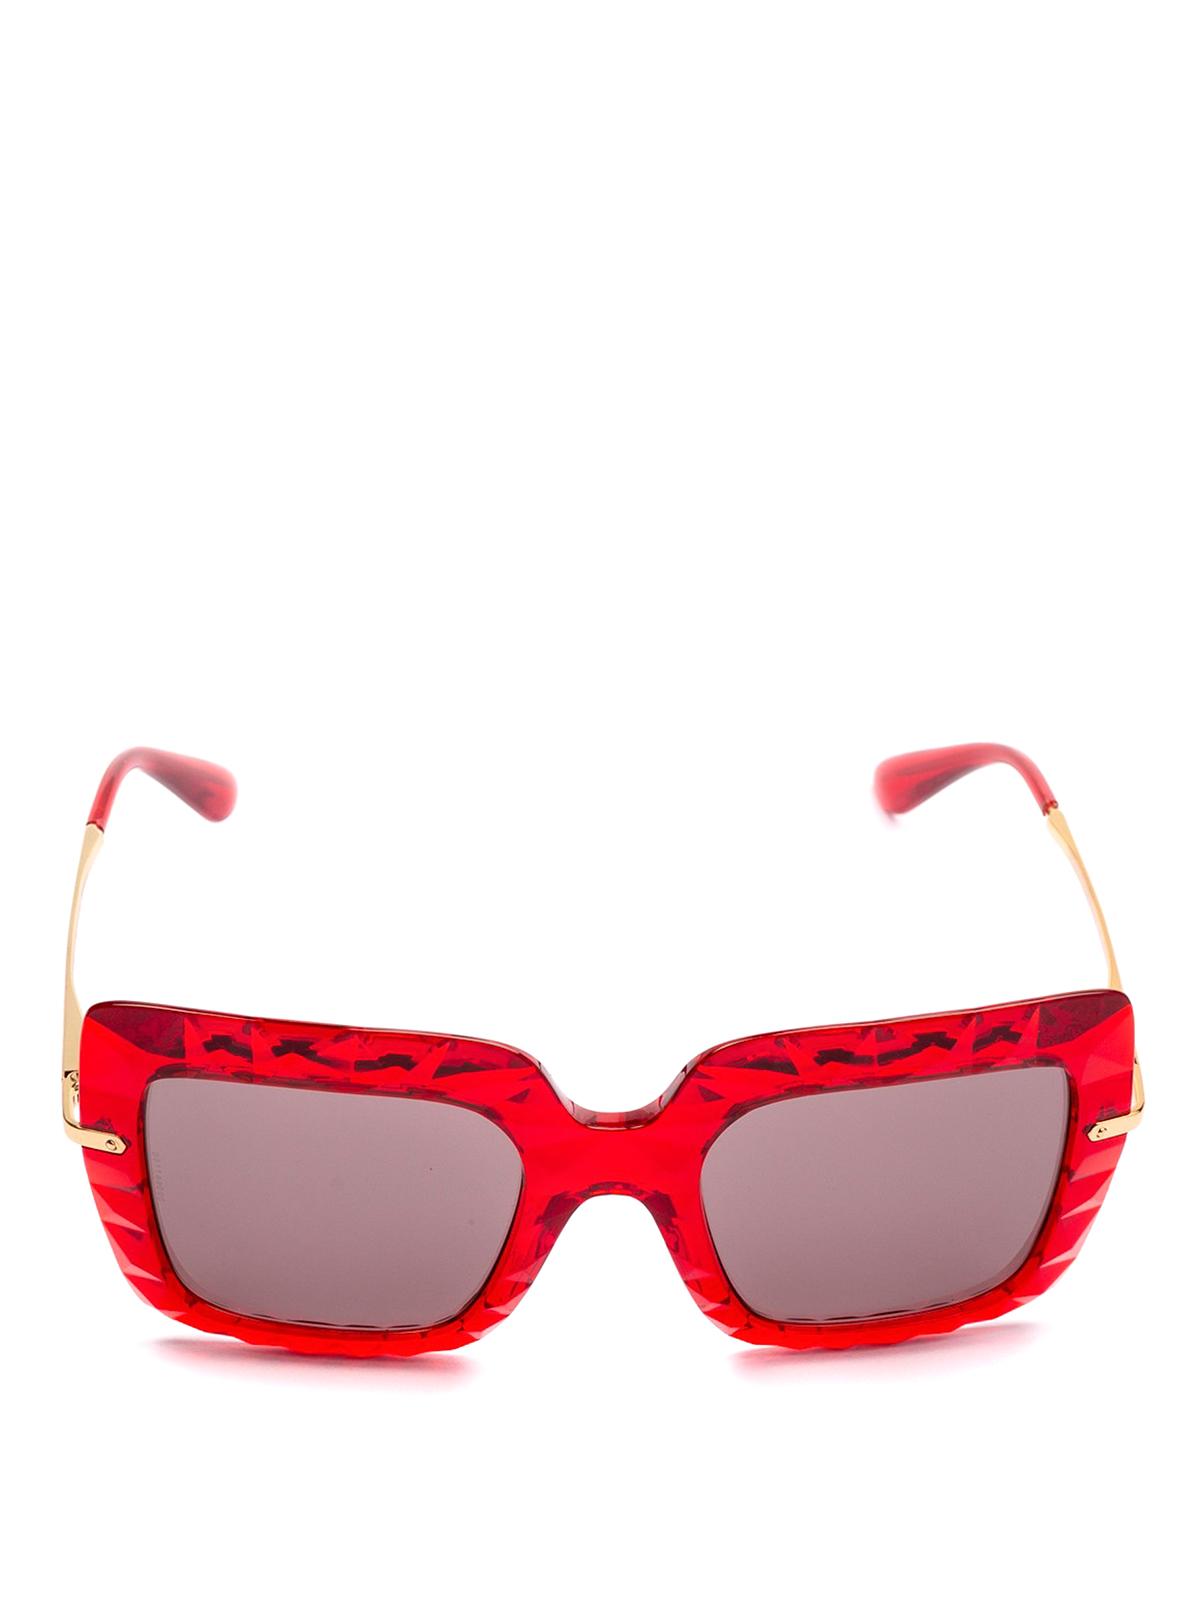 ff4622506899 Dolce & Gabbana - Red oversized sunglasses - sunglasses - DG6111 31477N